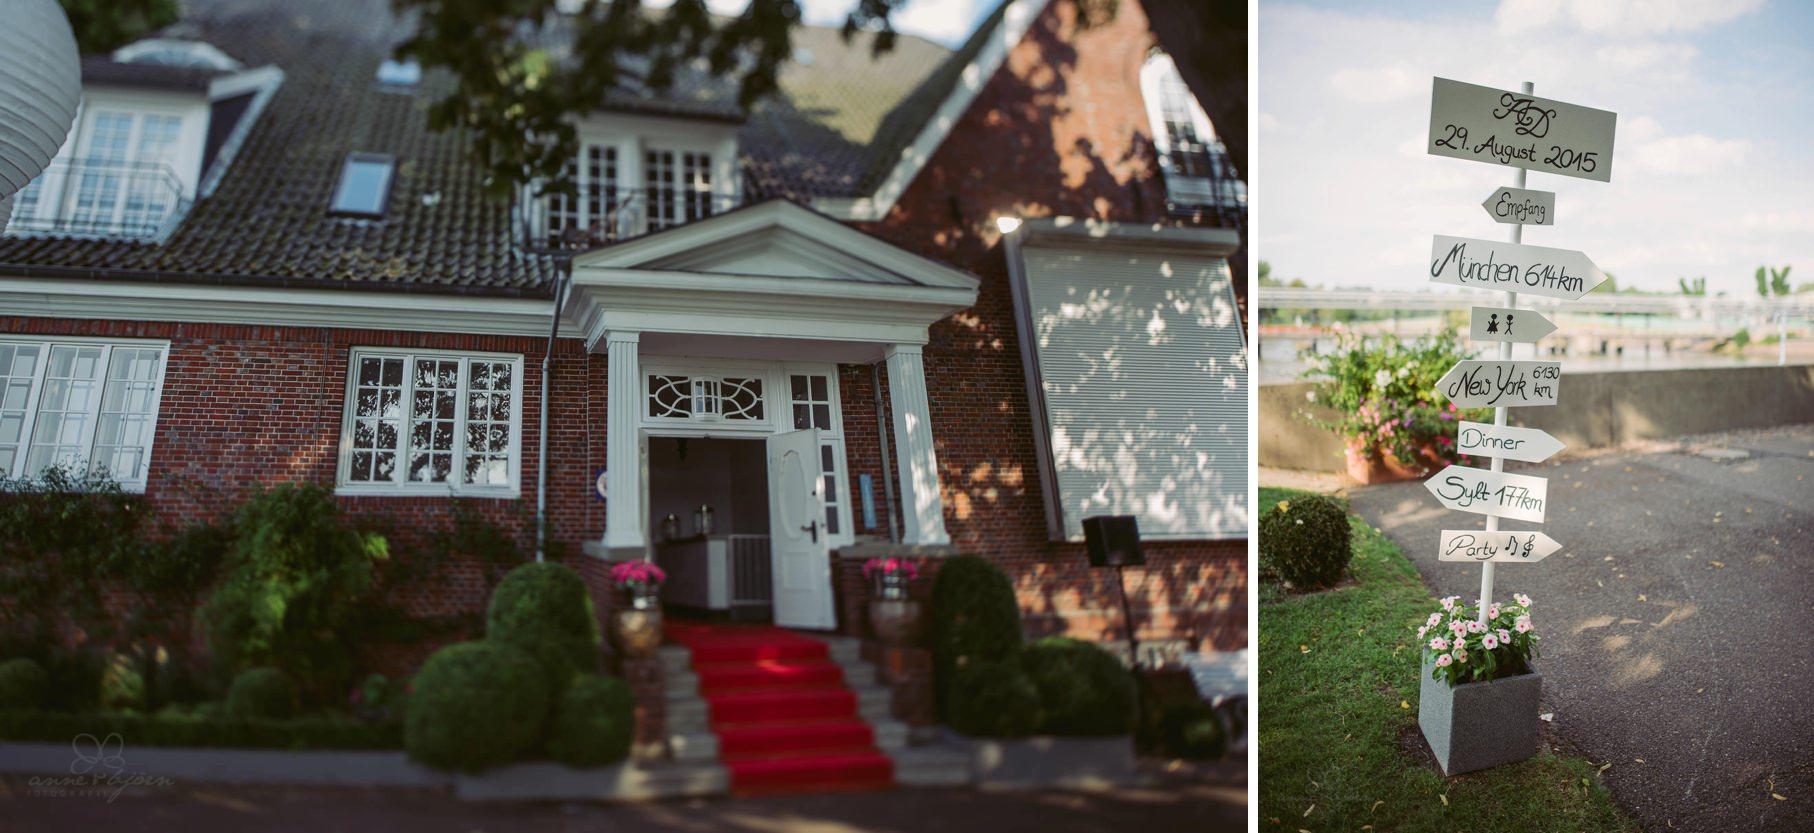 0066 aud blog 811 0788 - Hochzeit an der Hamburger Elbe - Ann-Katrin & Daniel